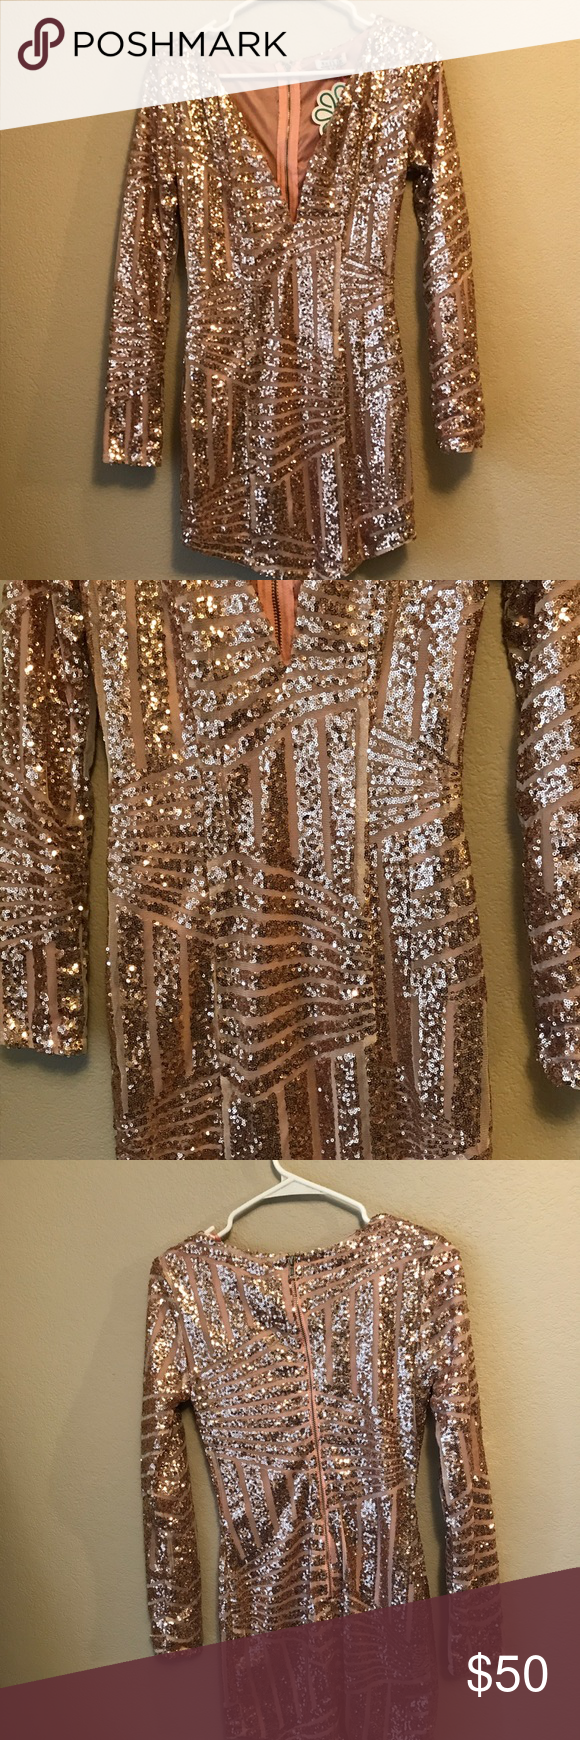 Nellis rose gold sequin dress boutique rose gold sequin dress